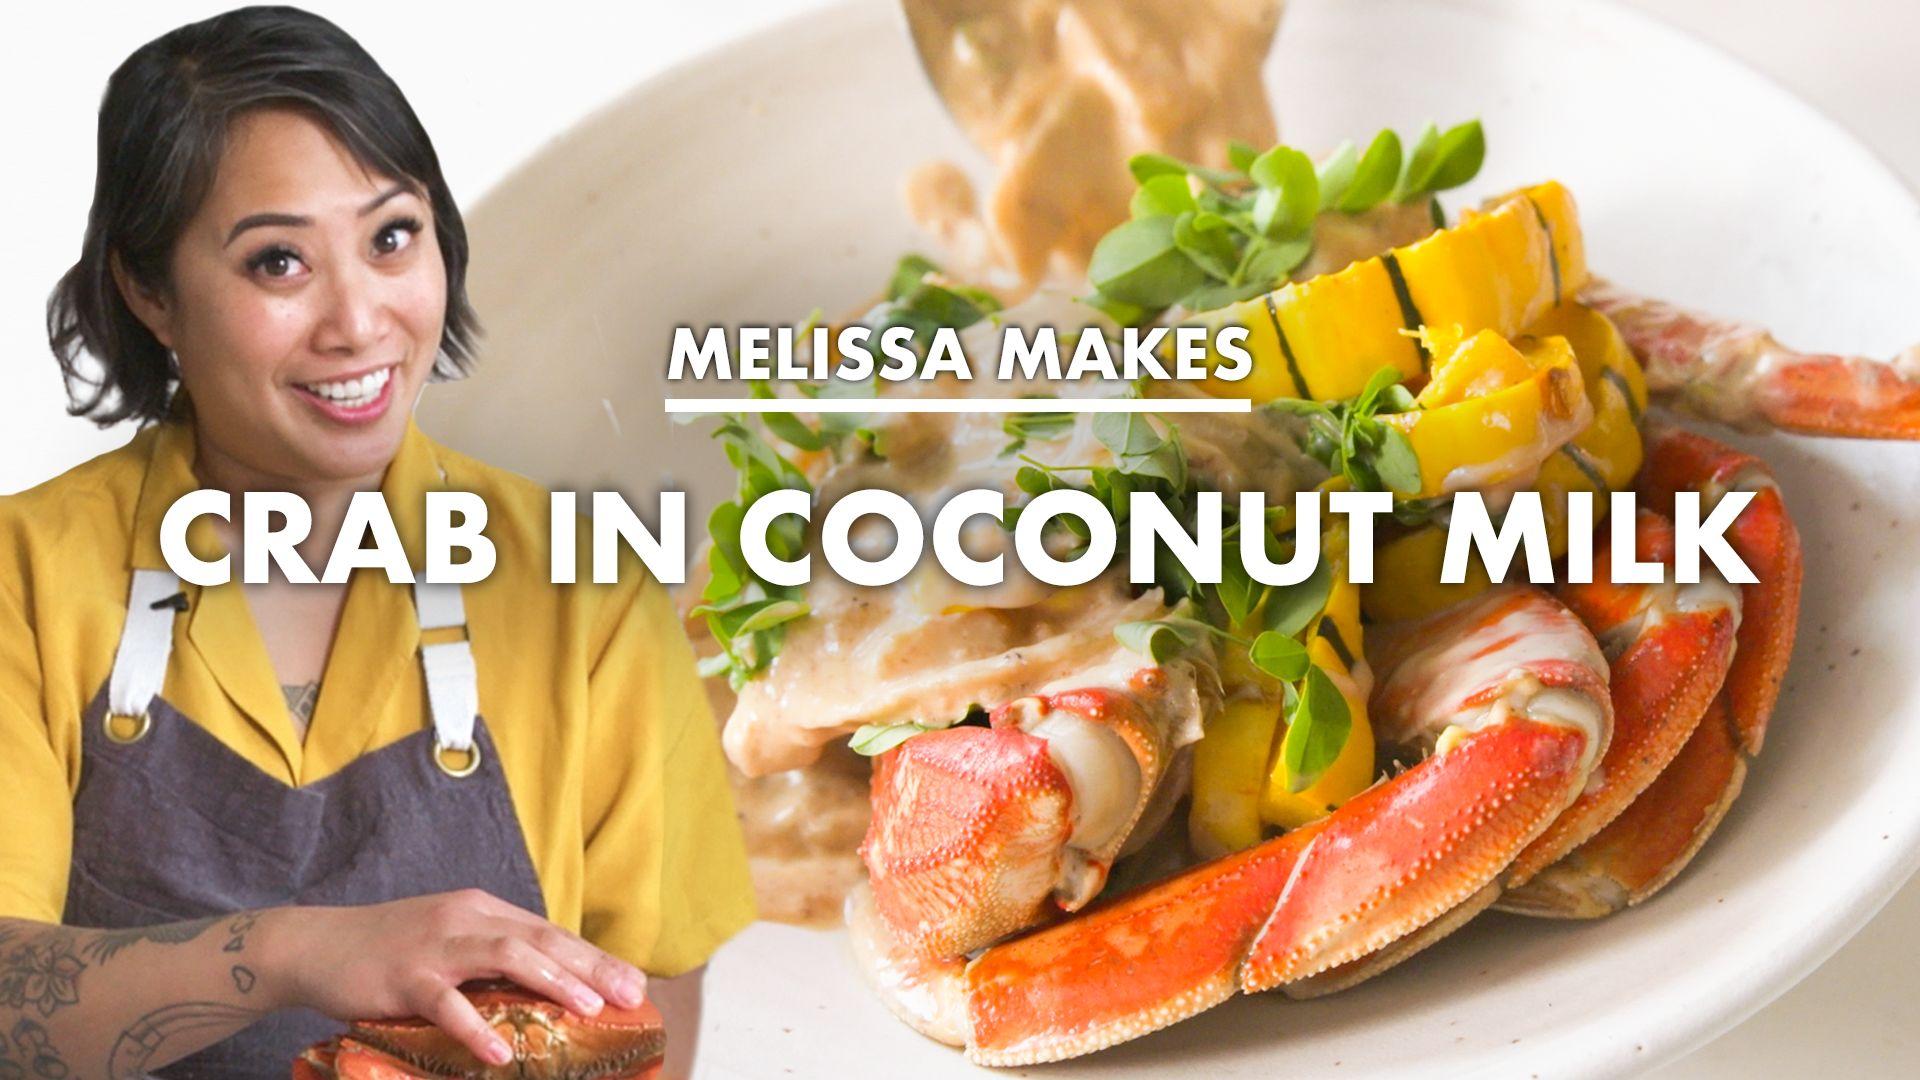 Watch From The Home Kitchen Melissa Makes Crab In Coconut Milk Ginataang Alimasag Bon Appetit Video Cne Bonappetit Com Bon Appetit